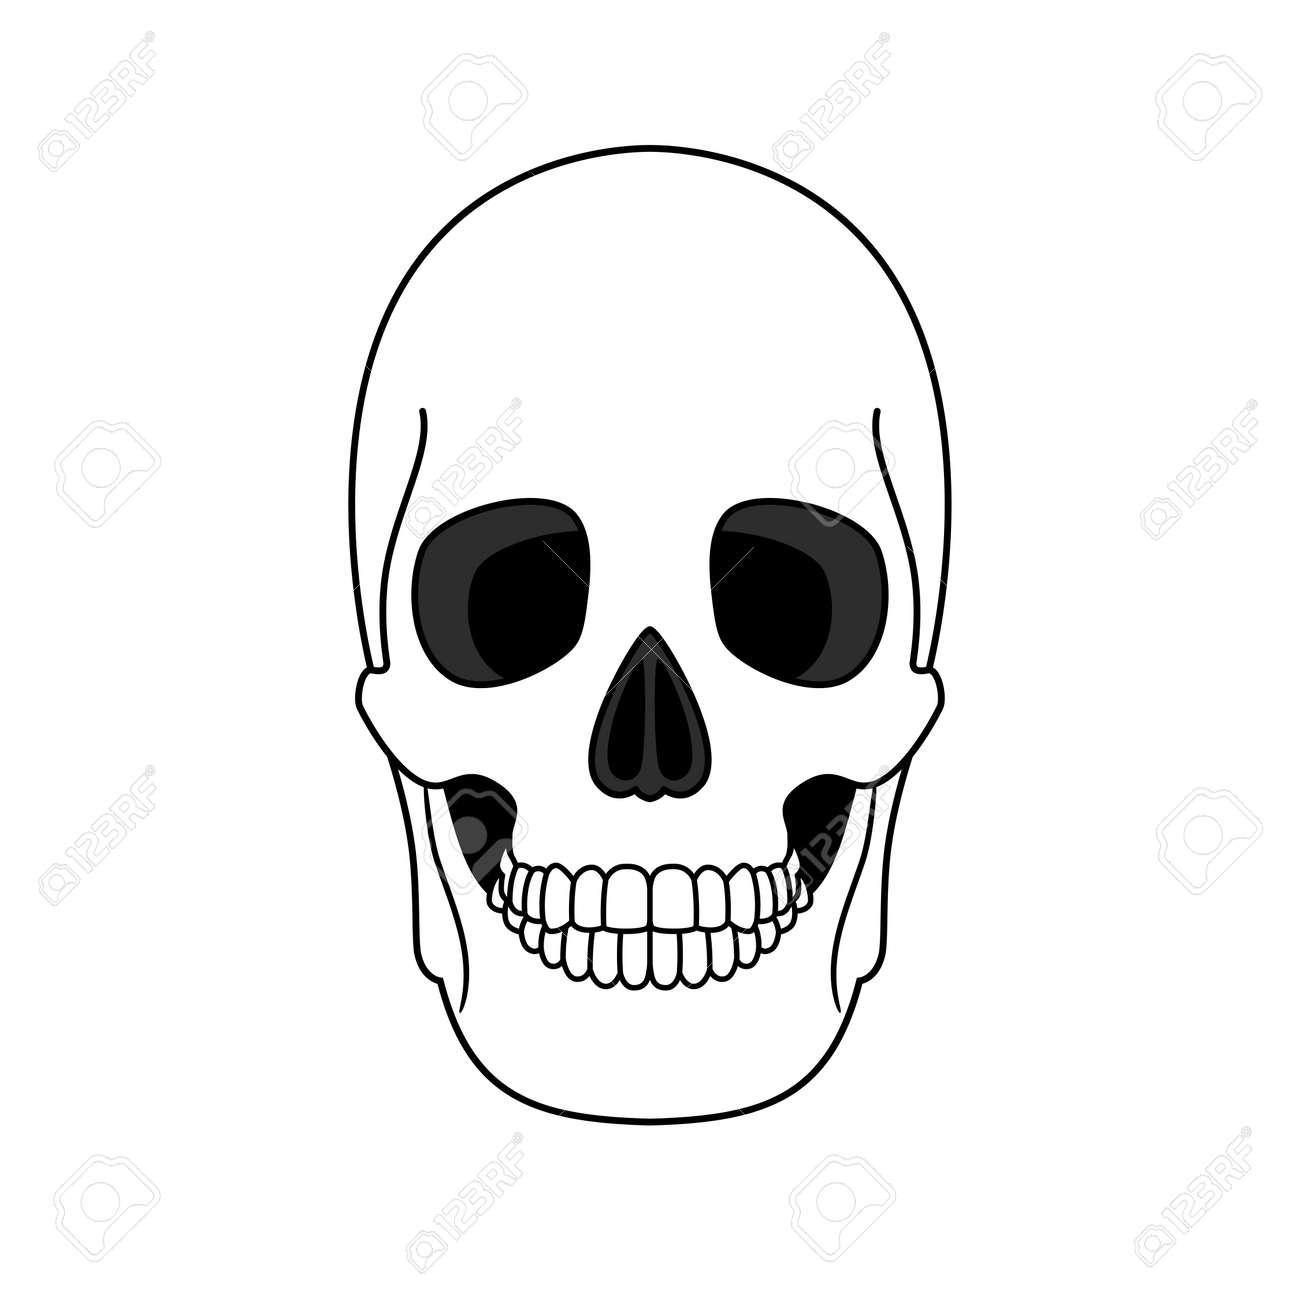 Decoration outline skull - 171345007